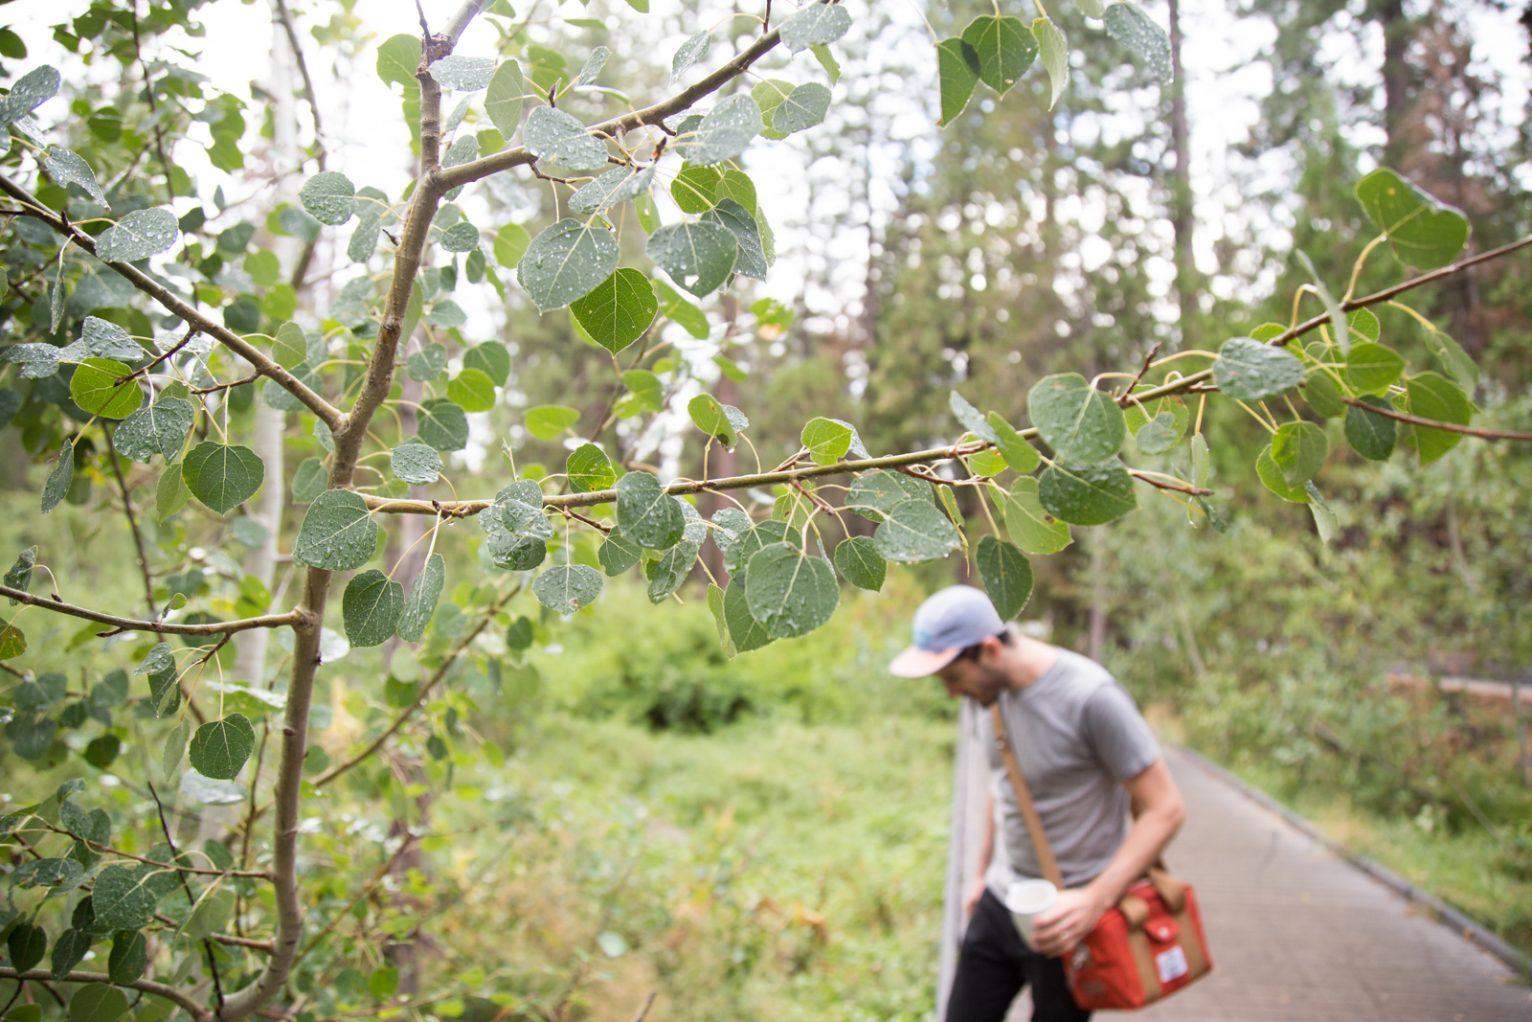 Josh Reeder-Esparza on the trail